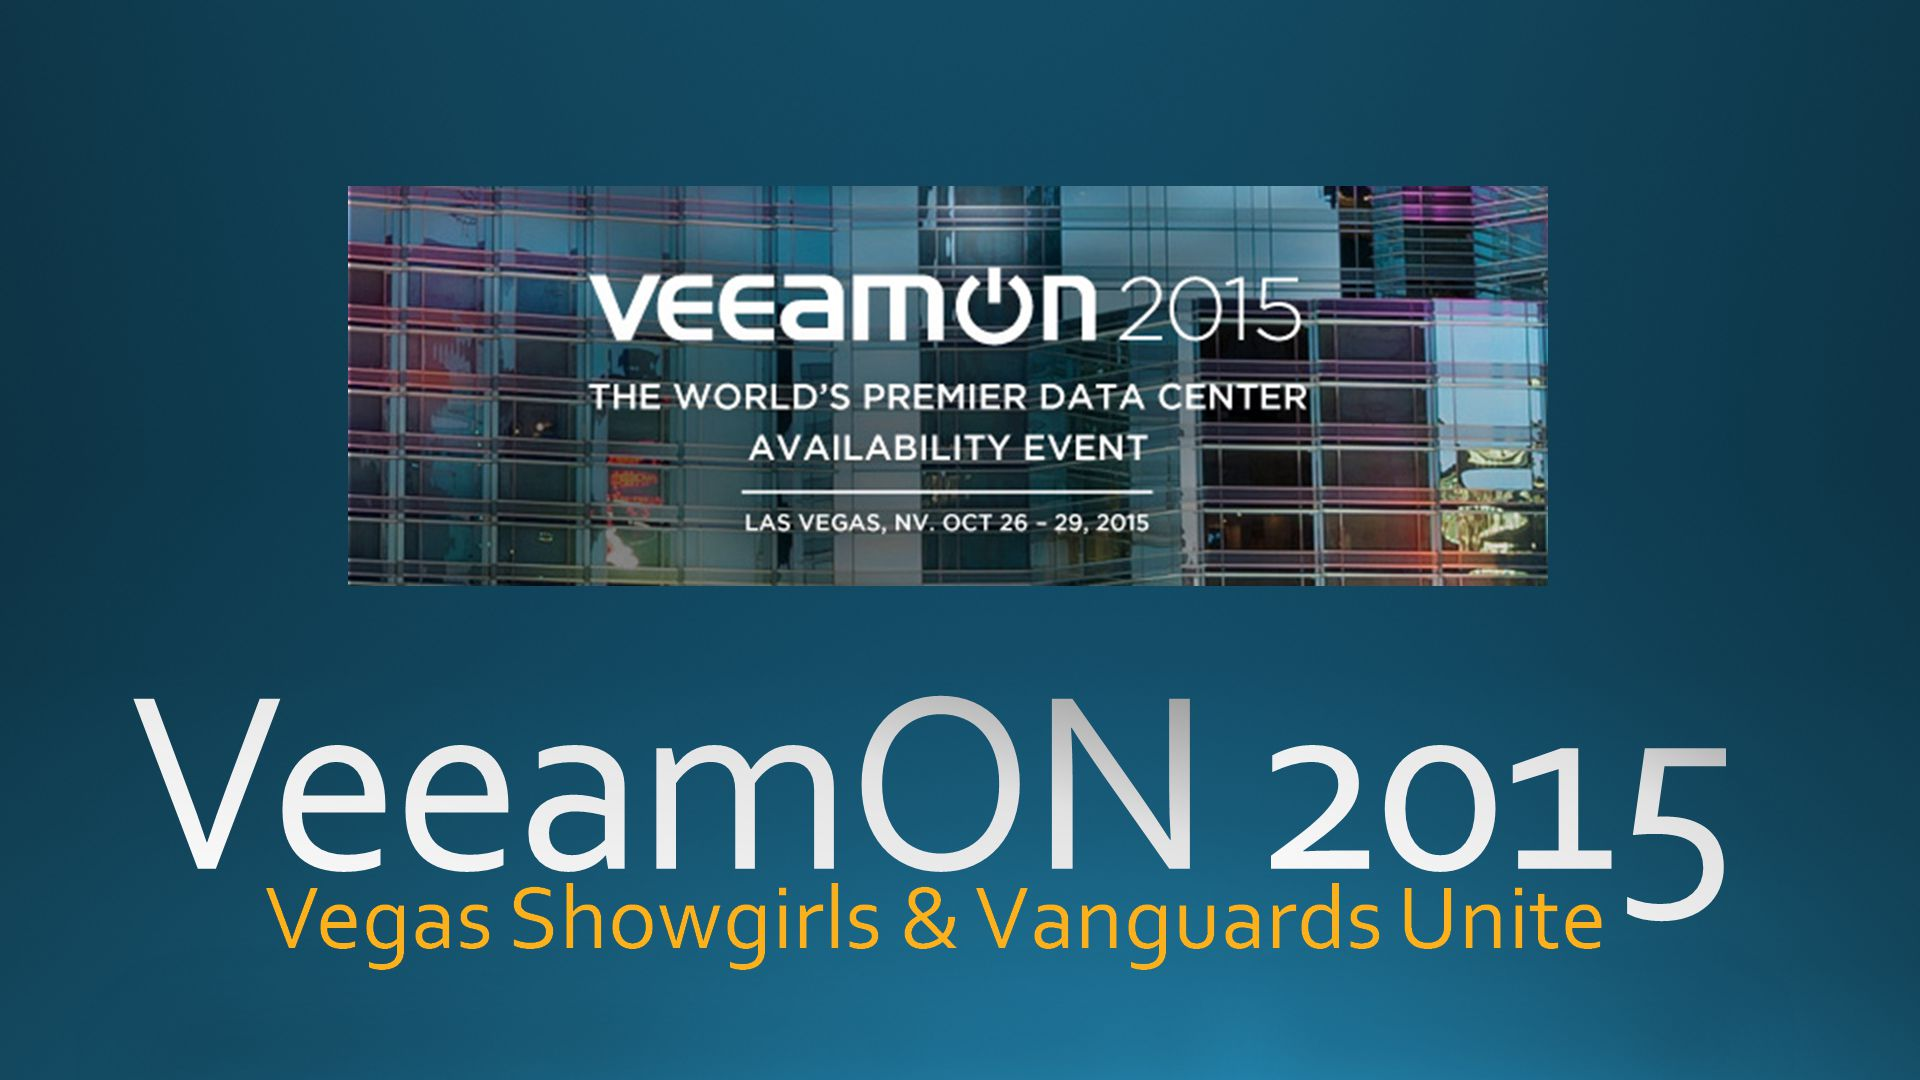 VeeamOn-Vegas-Showgirls-Vanguards-Unite VeeamOn - Vegas Showgirls & Vanguards Unite